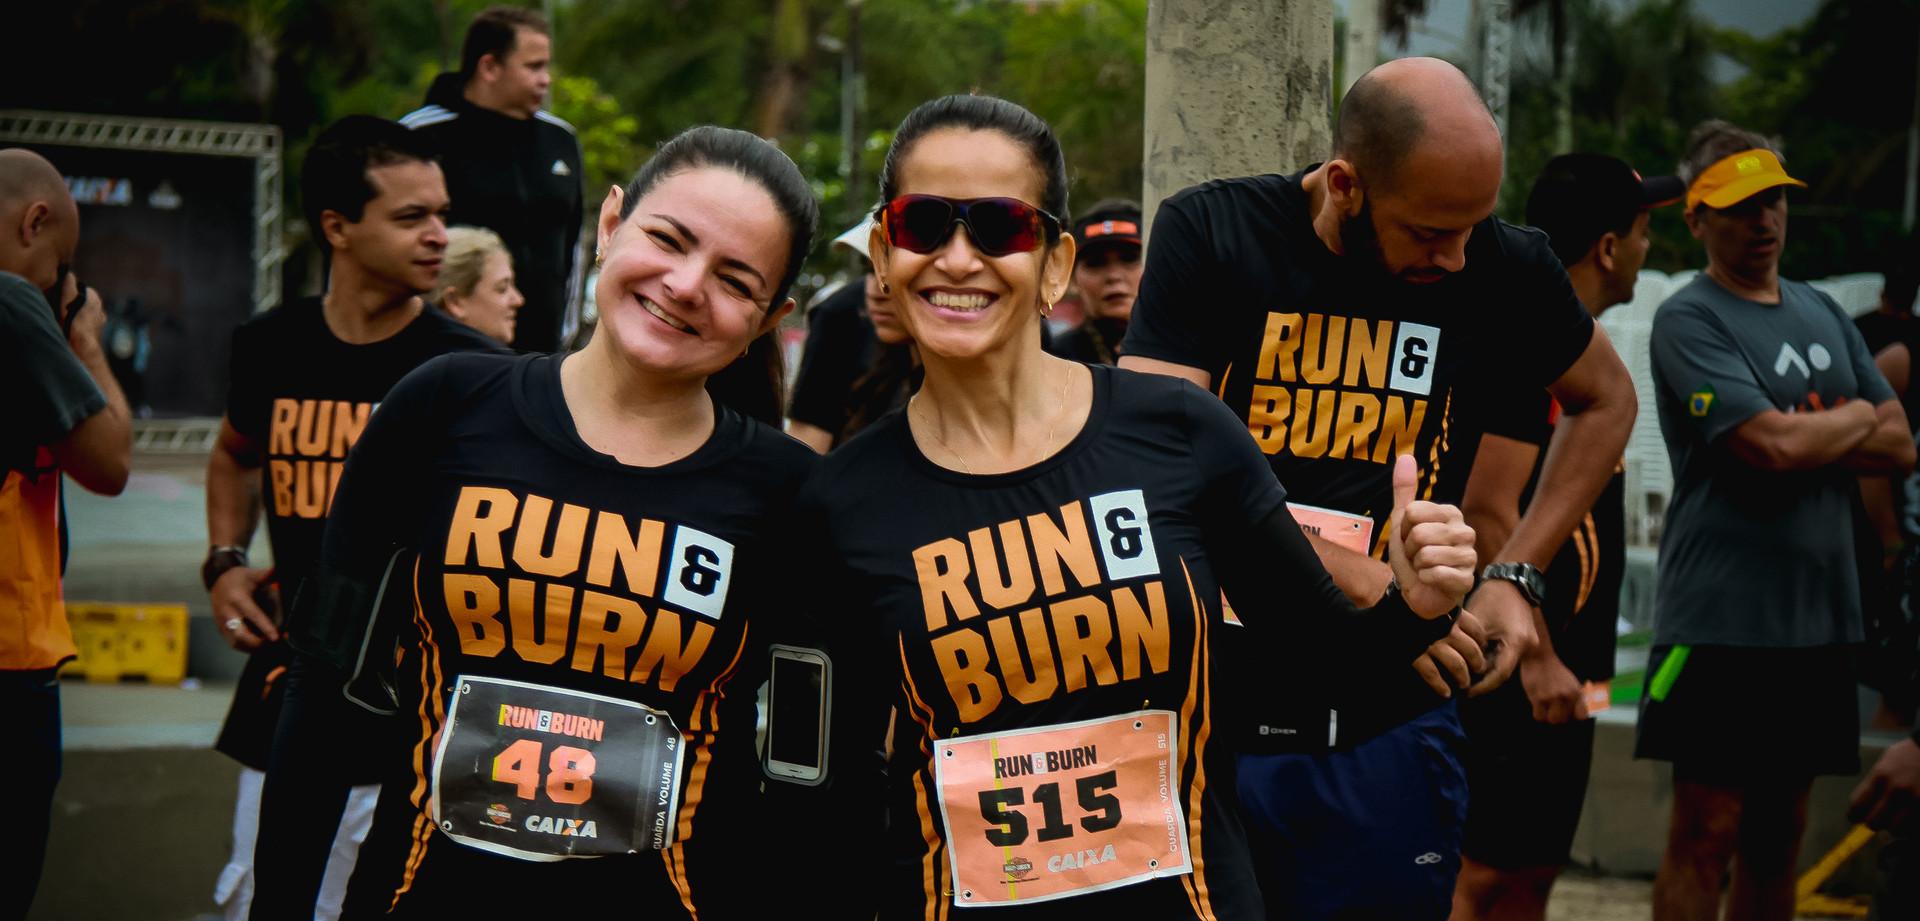 Run&Burn_Rodney Costa-0829.jpg